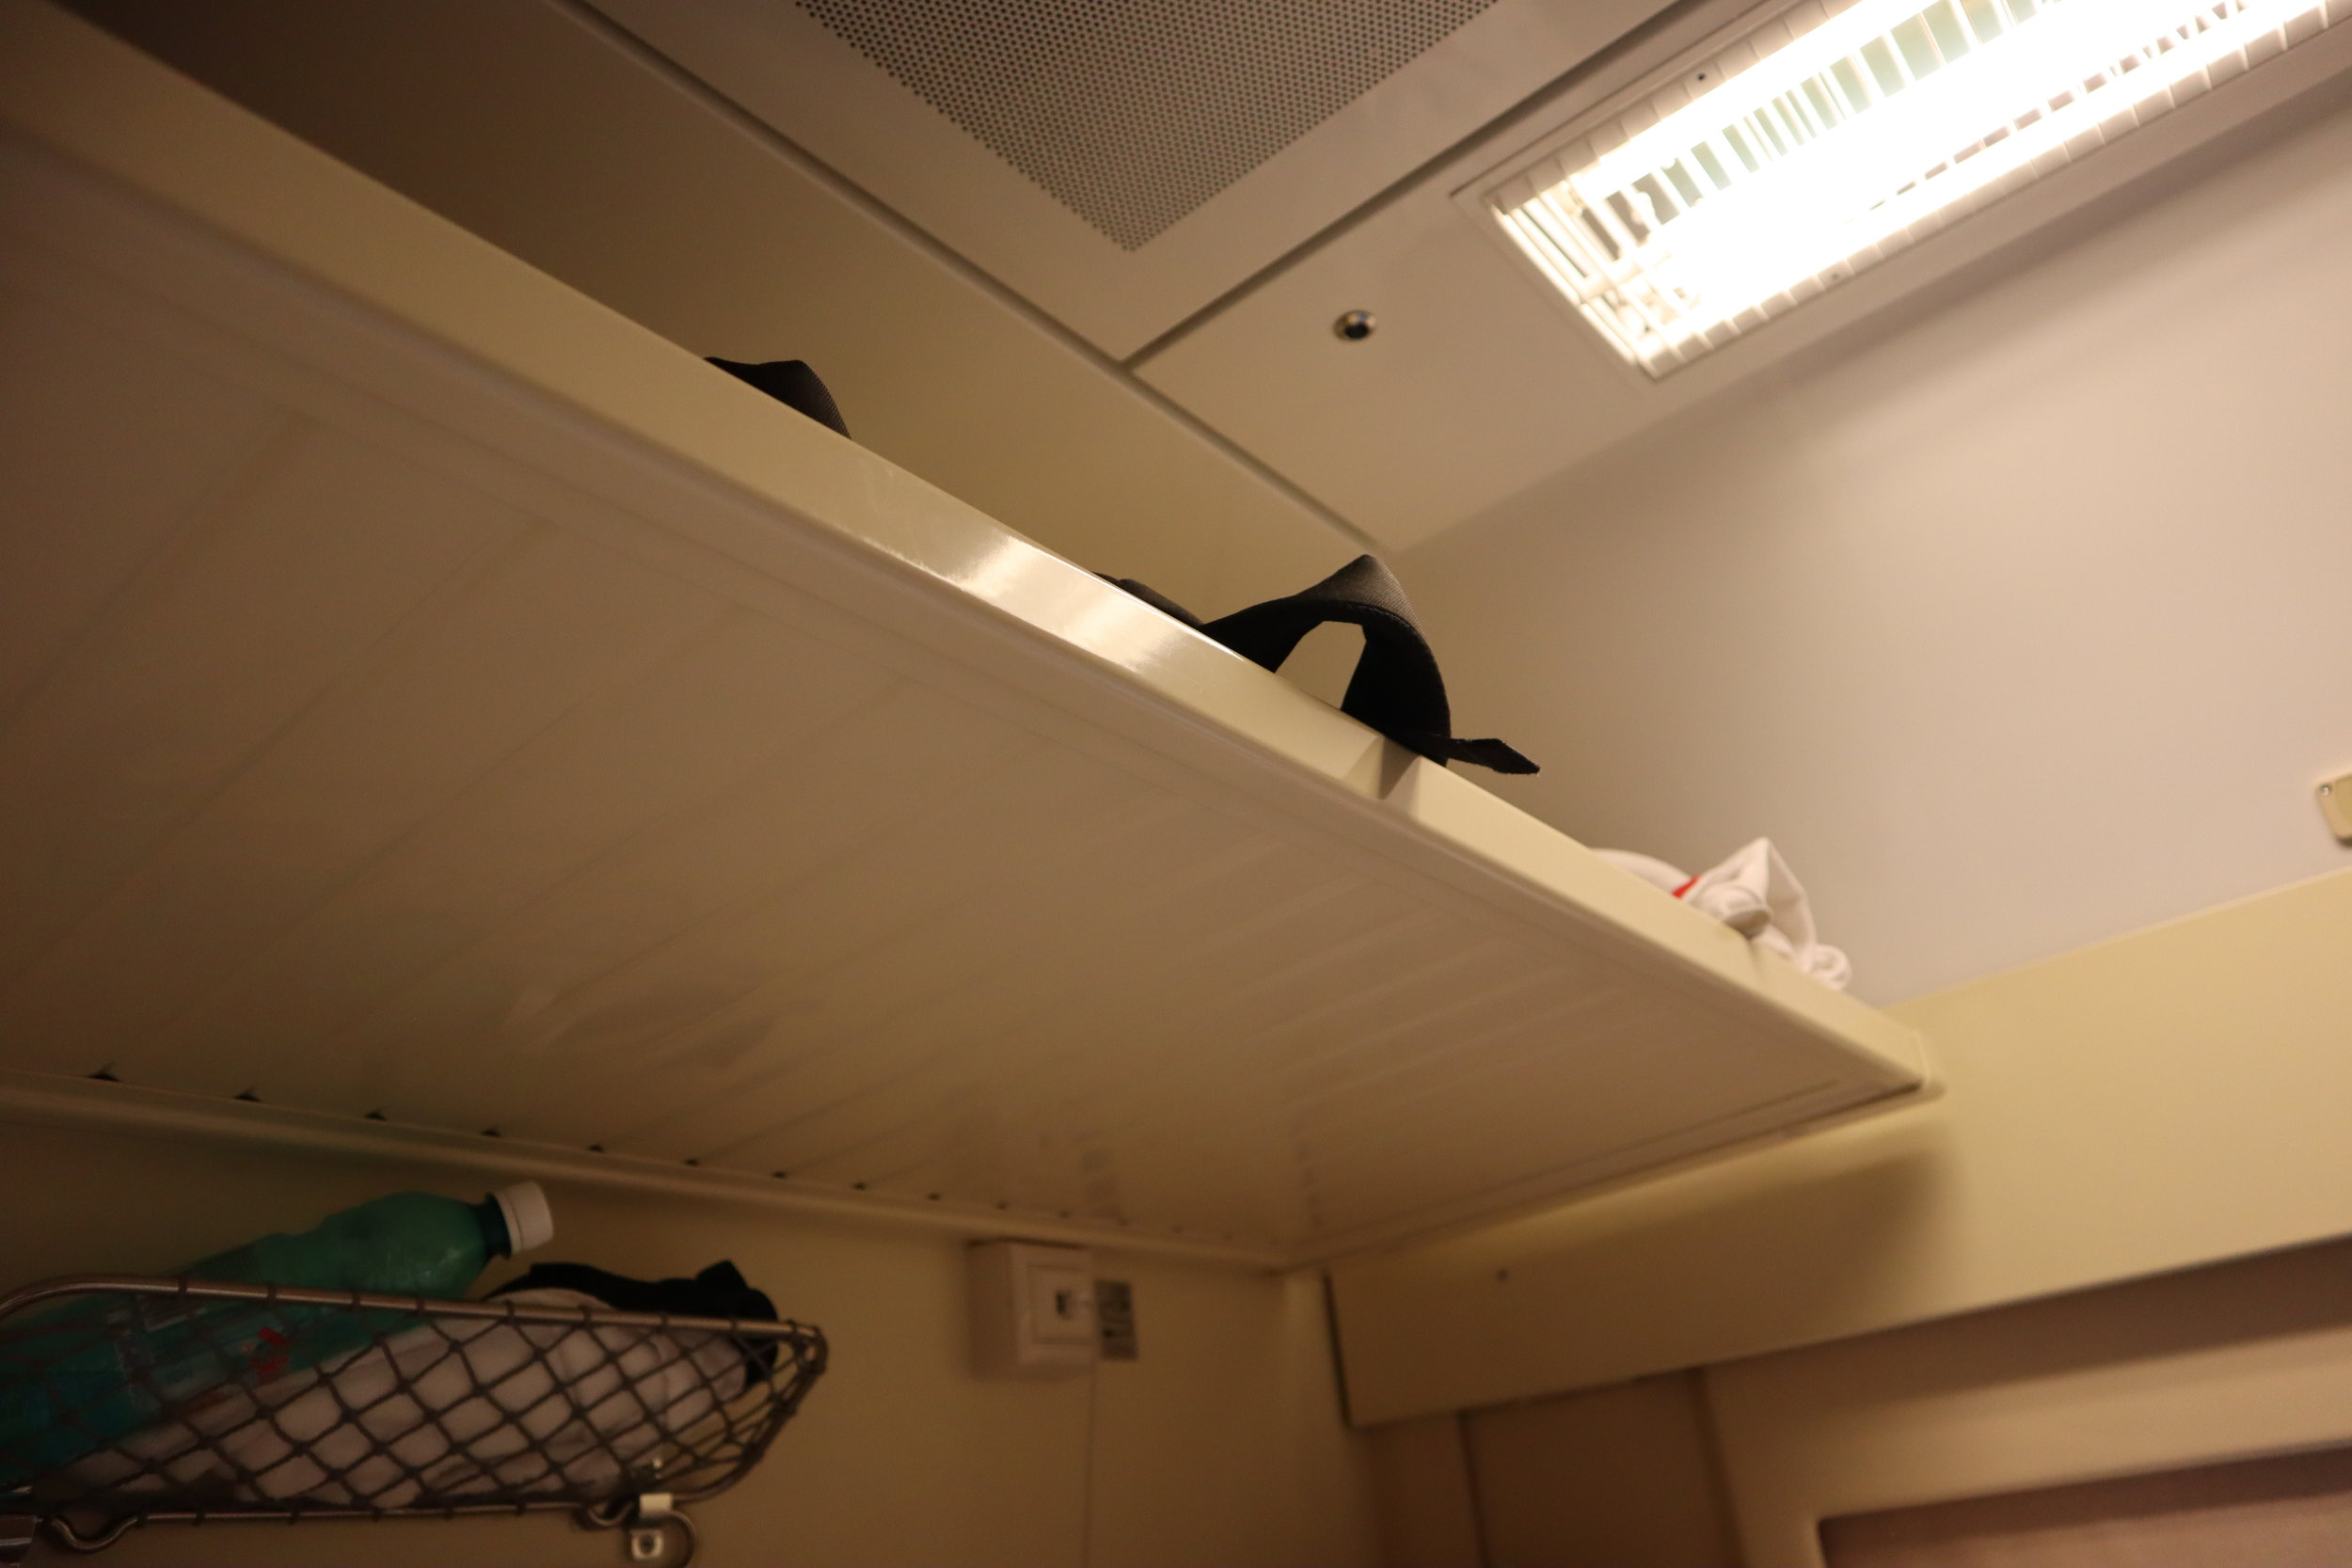 Trans-Siberian Railway Third Class – Storage above top bunk